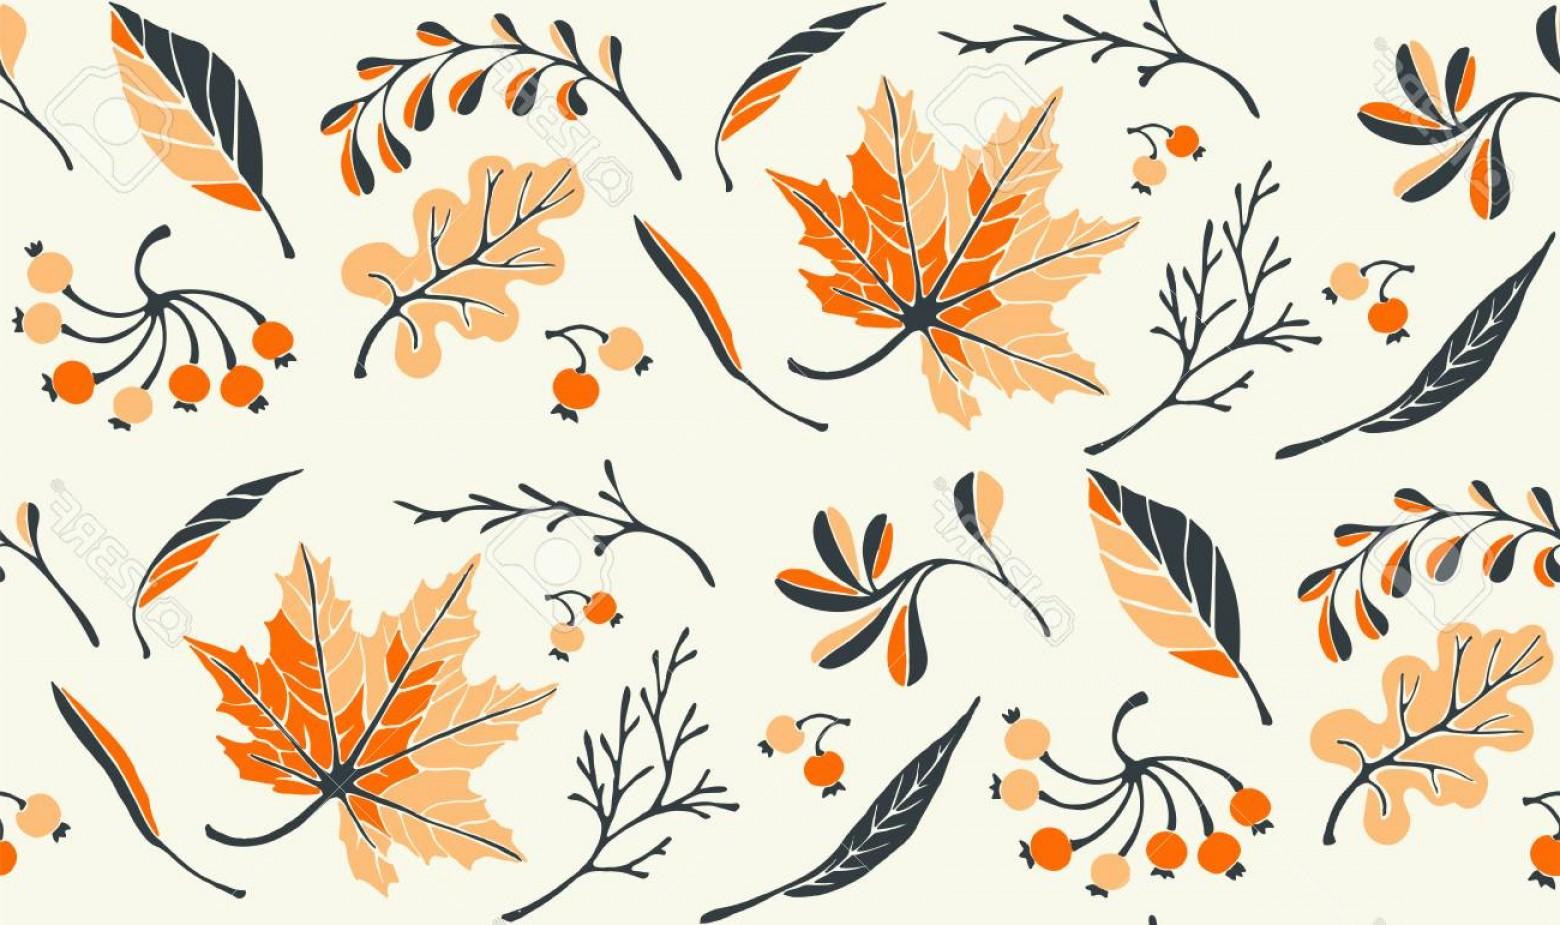 Cute Fall Wallpaper Designs For Your Desktop